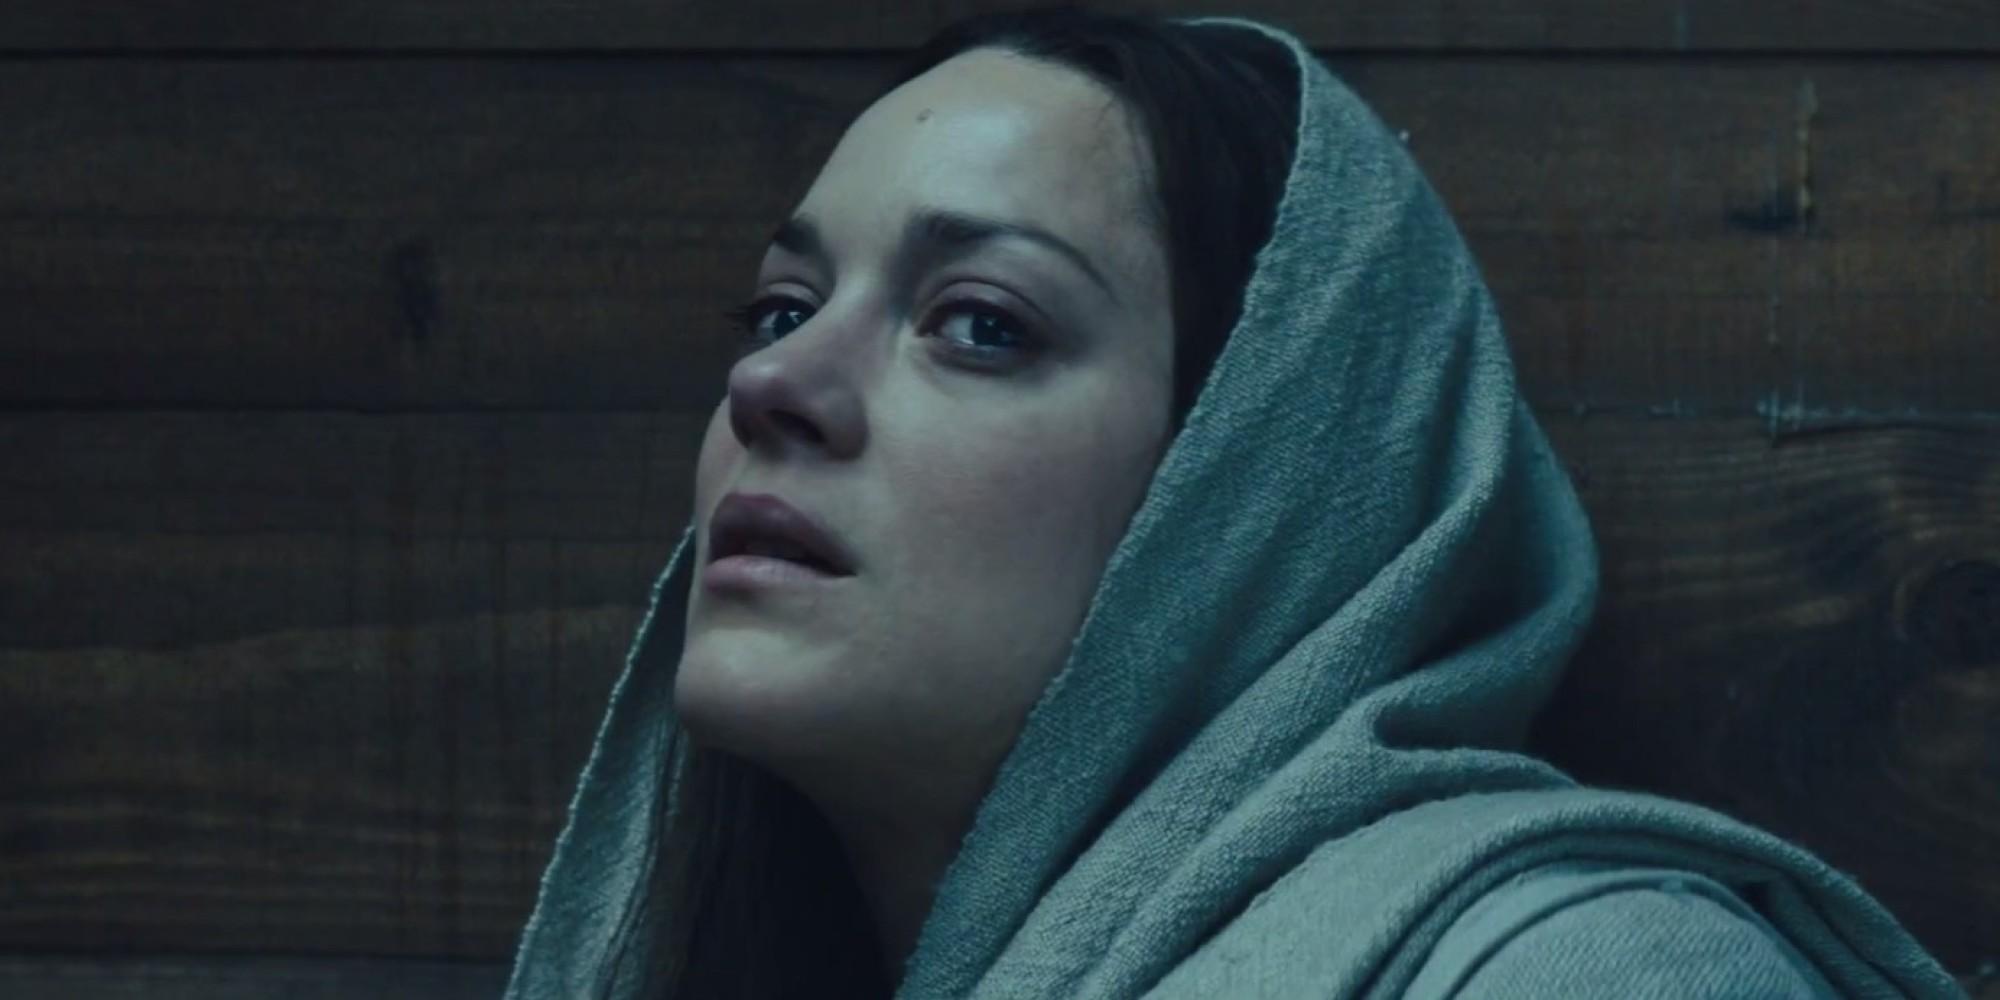 marion cotillard as lady macbeth in 2015 film macbeth